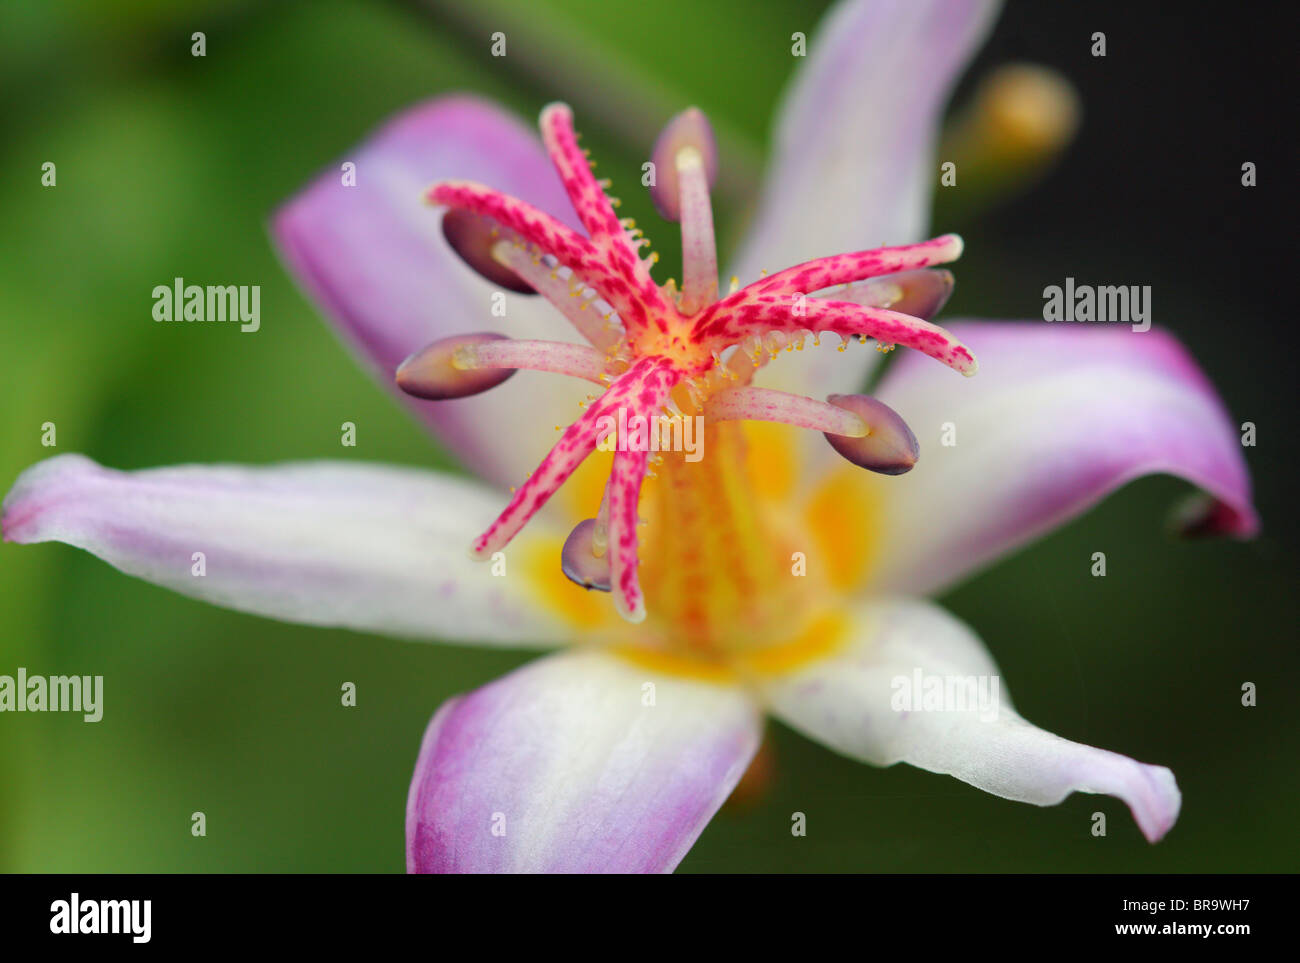 Toad lily flower close up tricyrtis hirta stock photo 31565107 alamy toad lily flower close up tricyrtis hirta izmirmasajfo